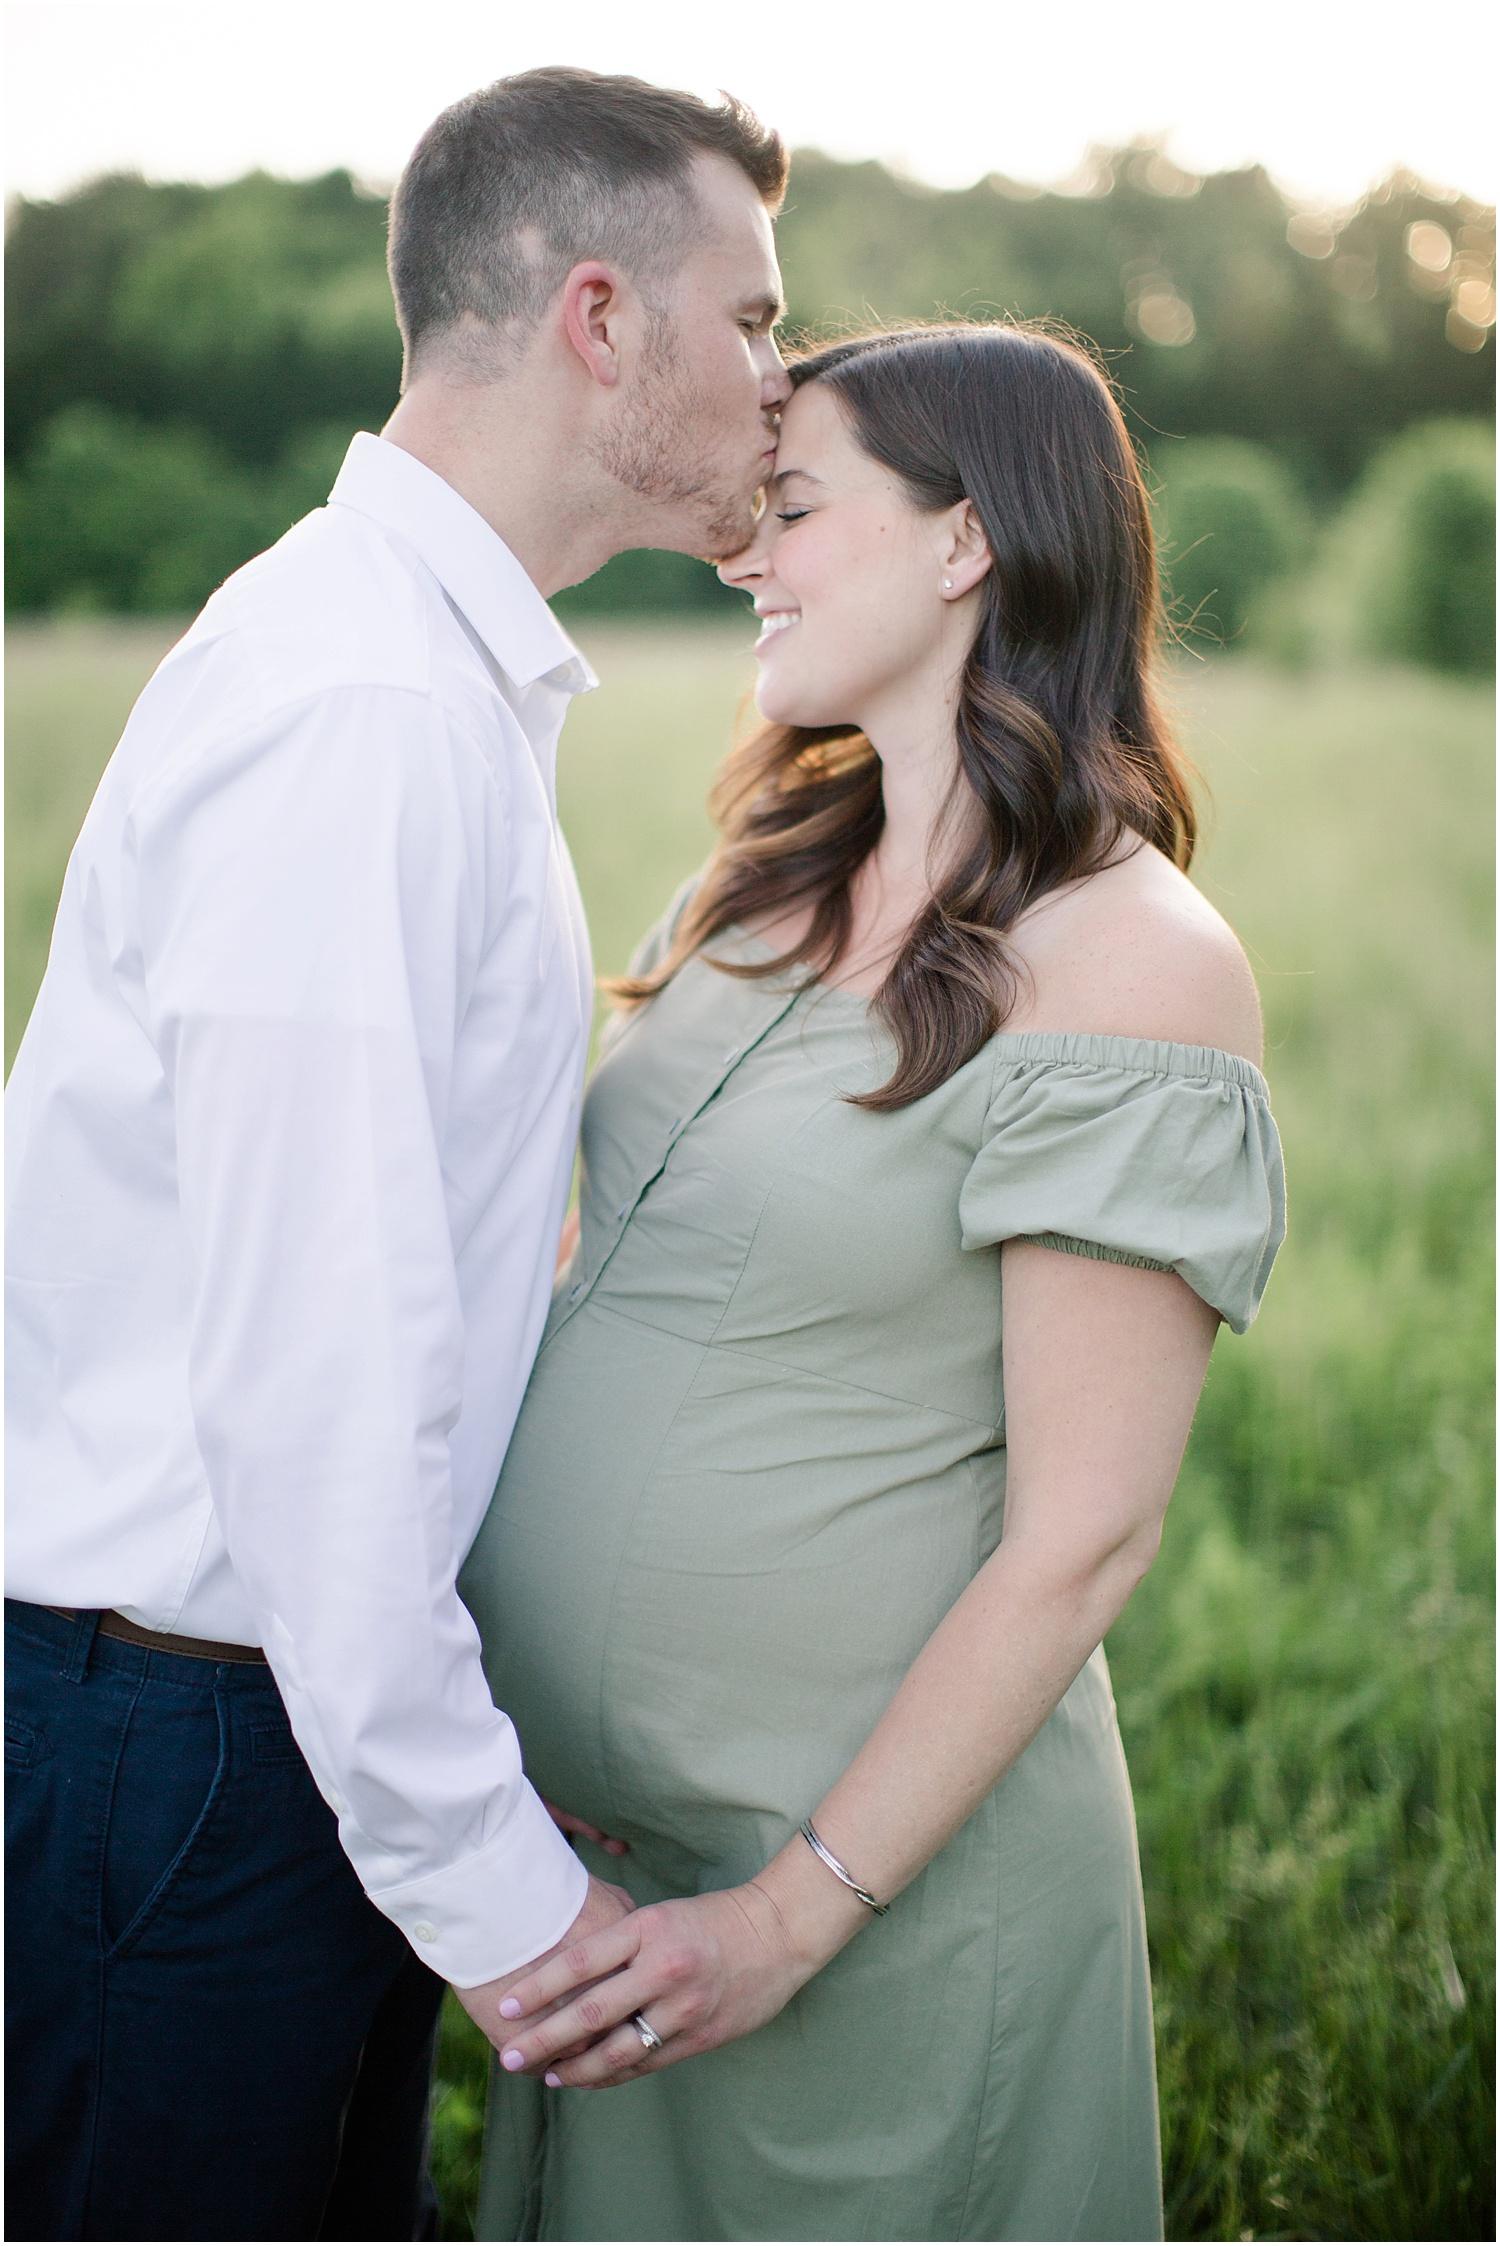 astleigh hill maternity session_0012.jpg